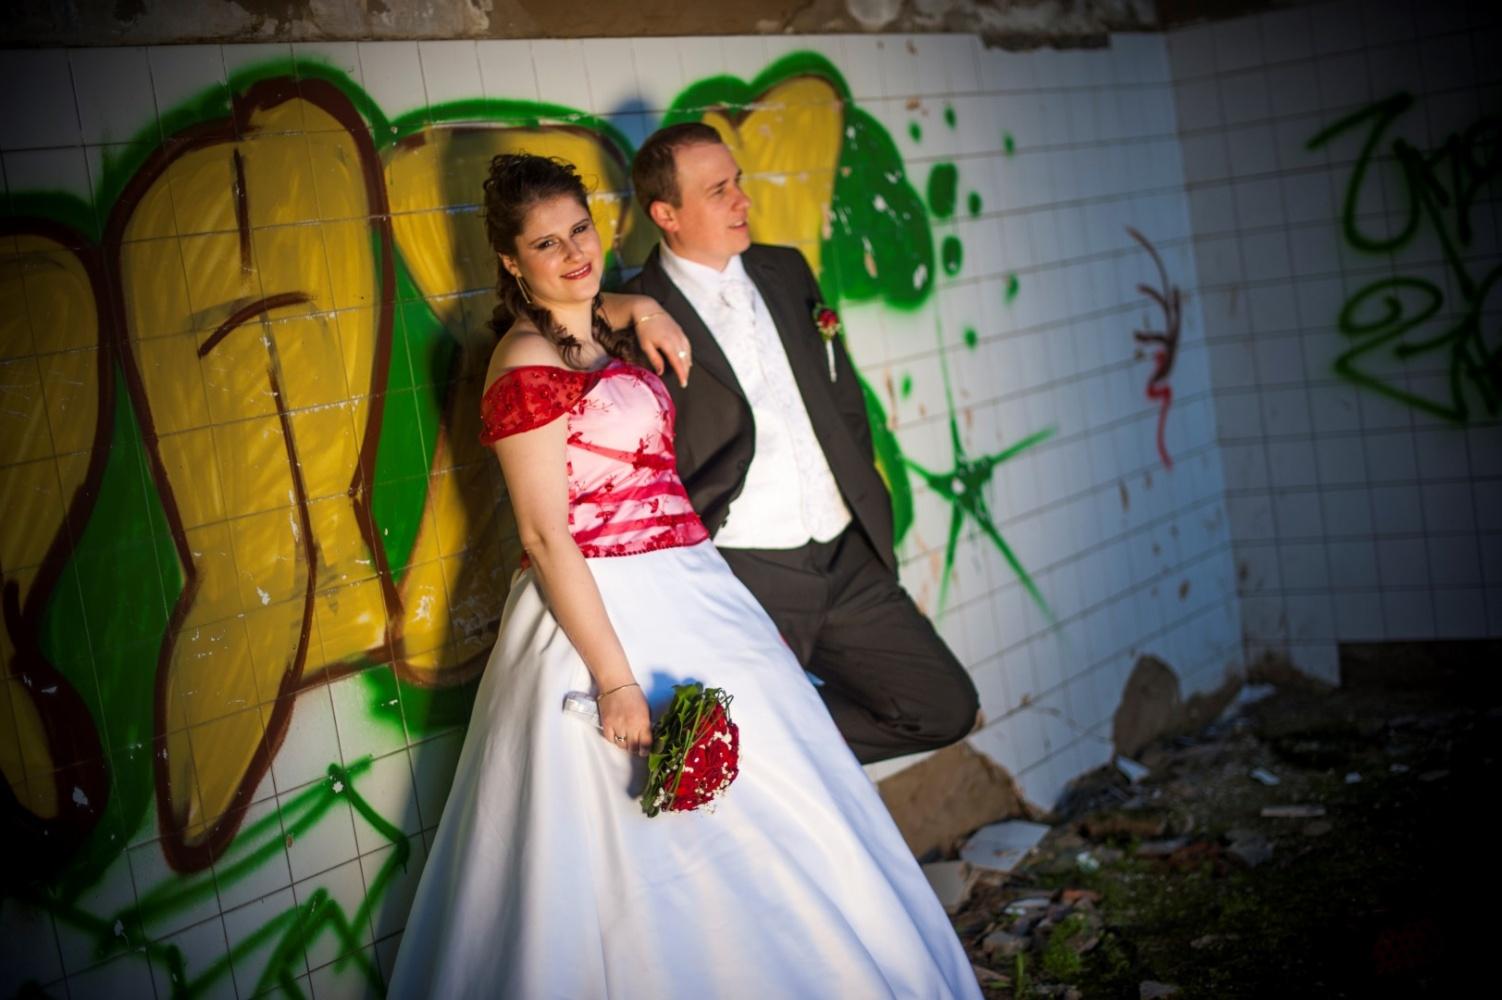 http://www.fotoz.sk/images/gallery-39/normal/svadobny-fotograf_eskuvoi-fotos_lacny-fotograf_fotograf-na-svadbu_juraj-zsok_fotograf-nitra_fotograf-galanta_juraj-zsok276.jpg